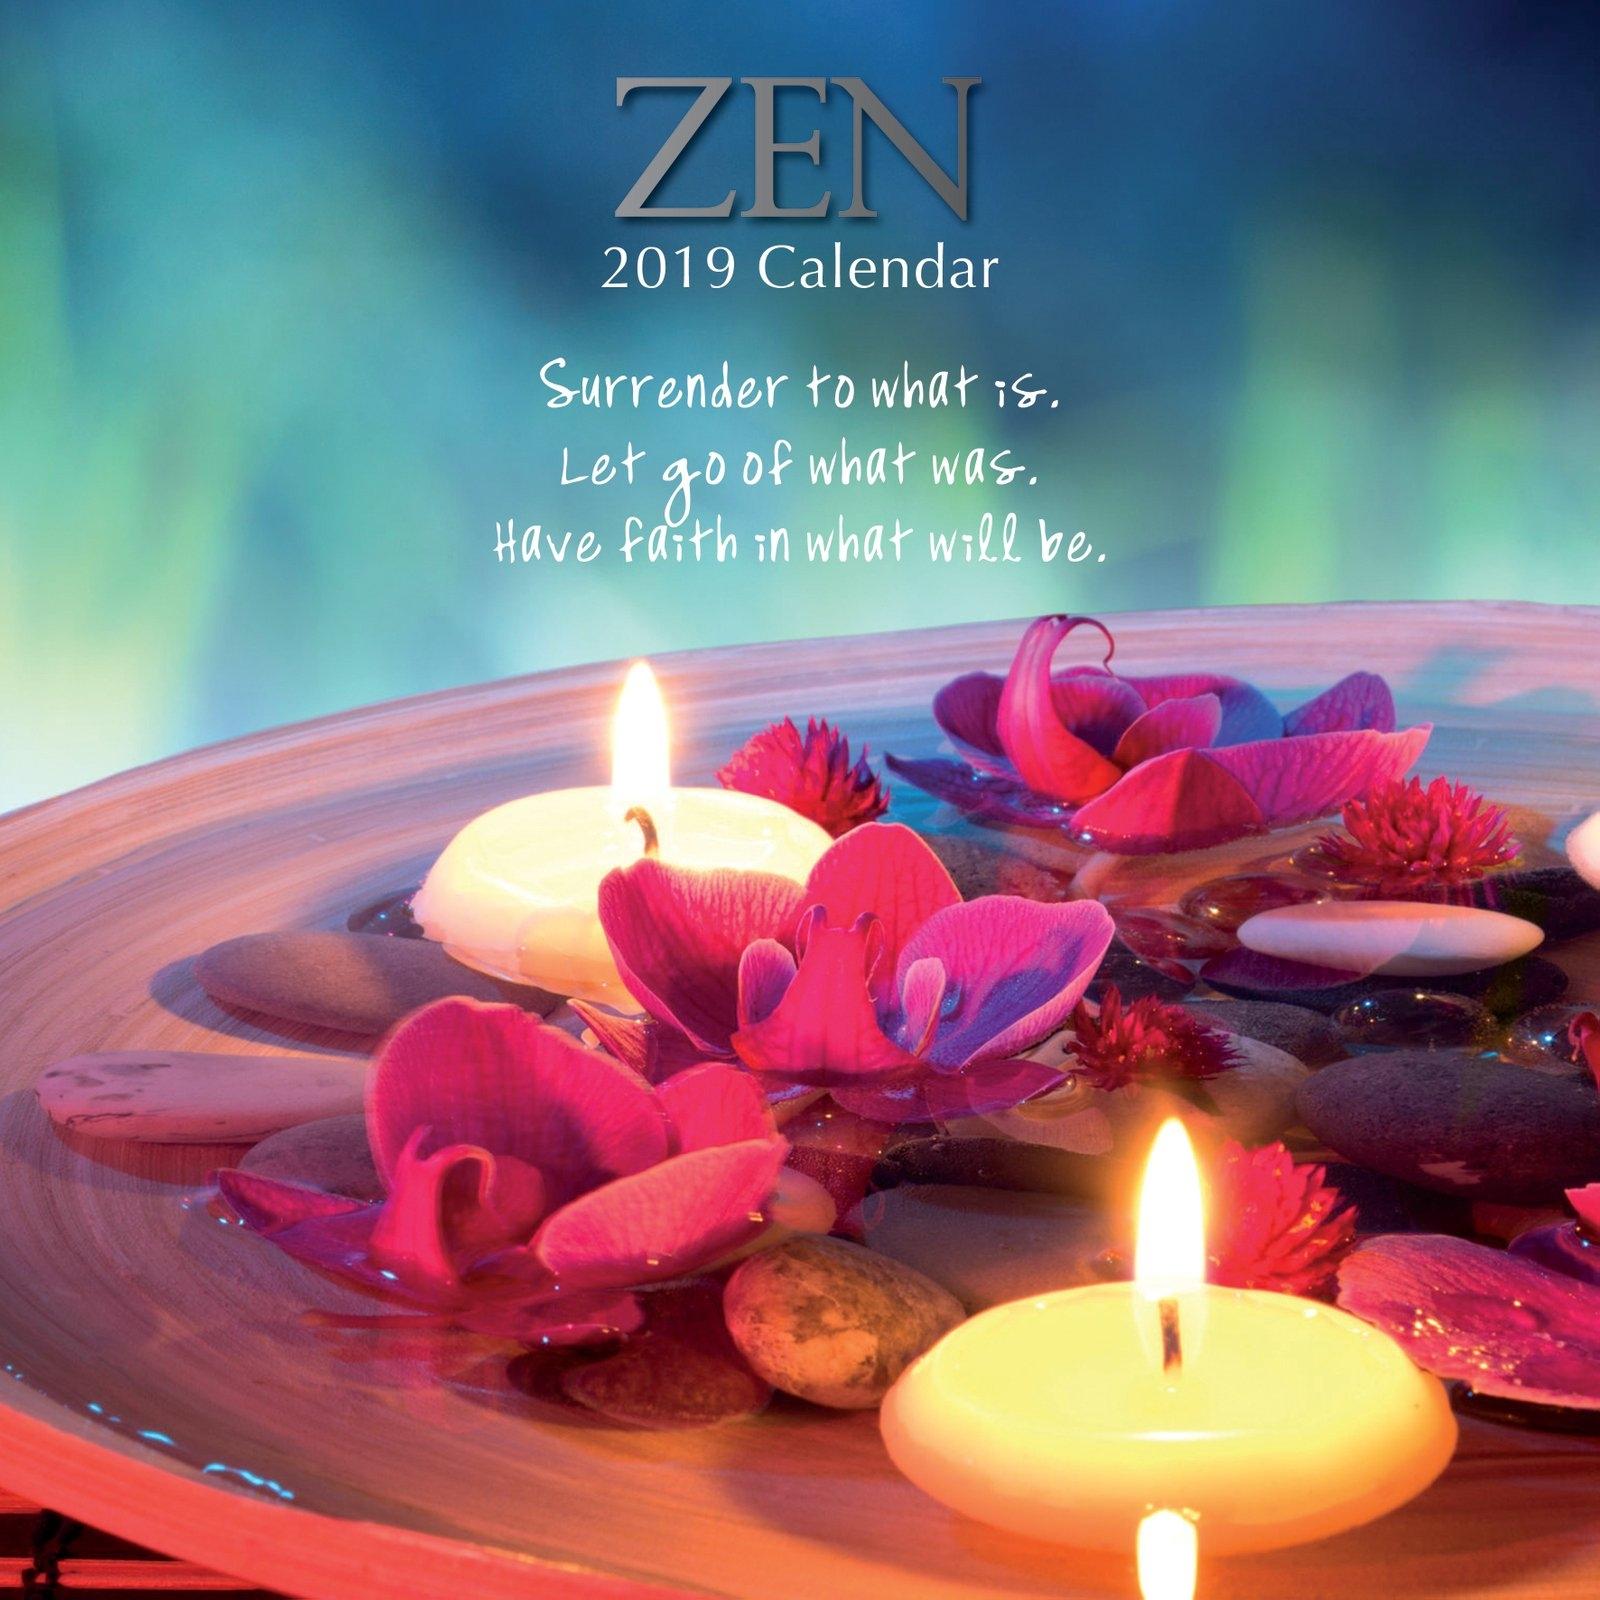 Zen – 2019 Wall Calendar 16 Month Premium Square 30X30Cm (N 2019 Calendar Zen